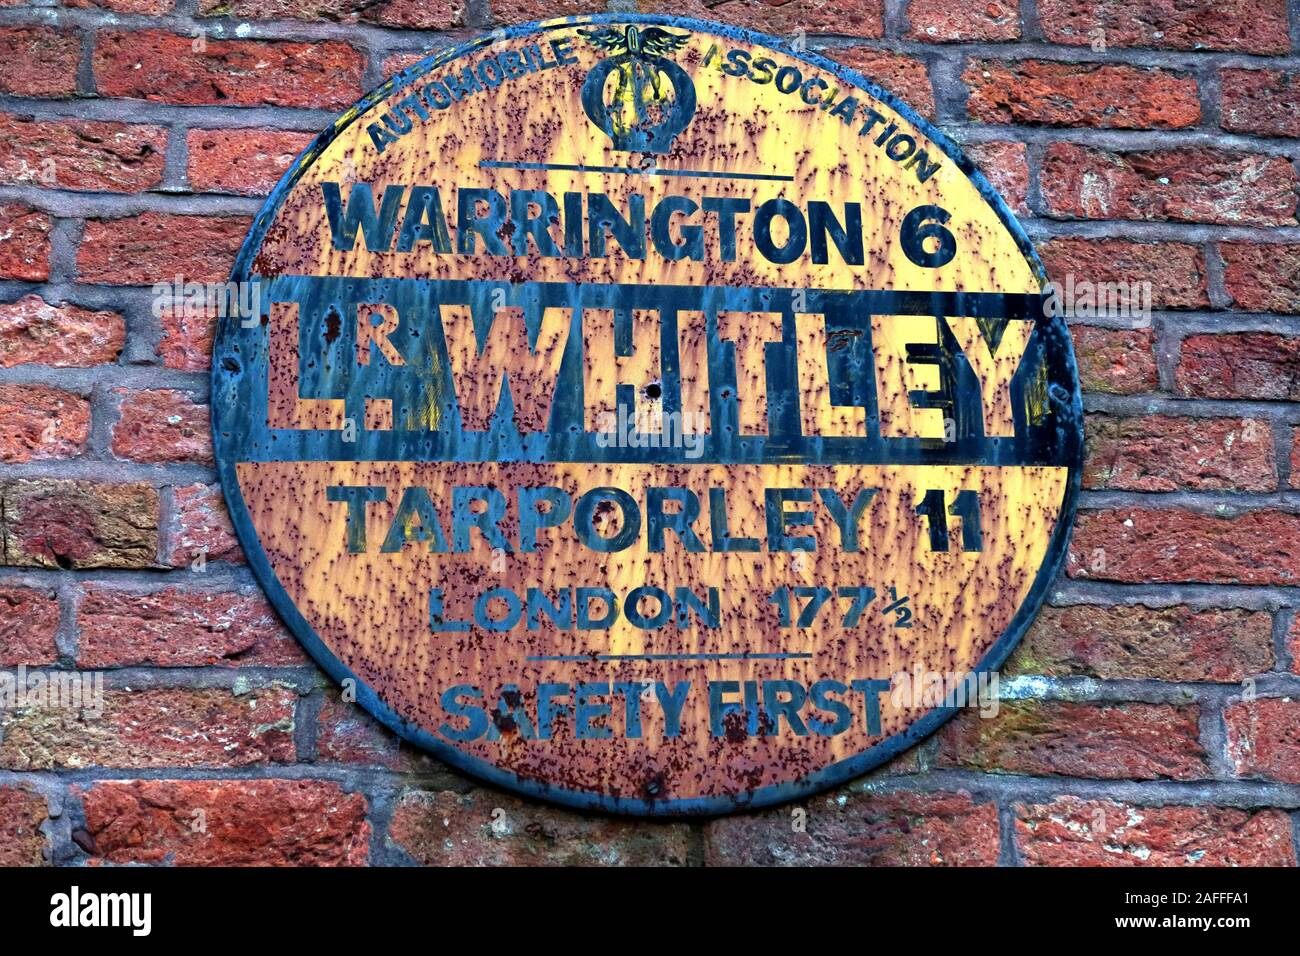 @HotpixUK,HotpixUK,GoTonySmith,AA,on wall,wall mounted,history,motoring,Warrington 6 miles,Tarporley 11 miles,London 177,Safety First,village,Lower Whitley Village,sign,WA4,circular,circular sign,yellow black,yellow,black,distance,distances,A49,road,rust,rusty,old,Antique AA Road sign,Antique,AA Road sign,AA Sign,British brick world